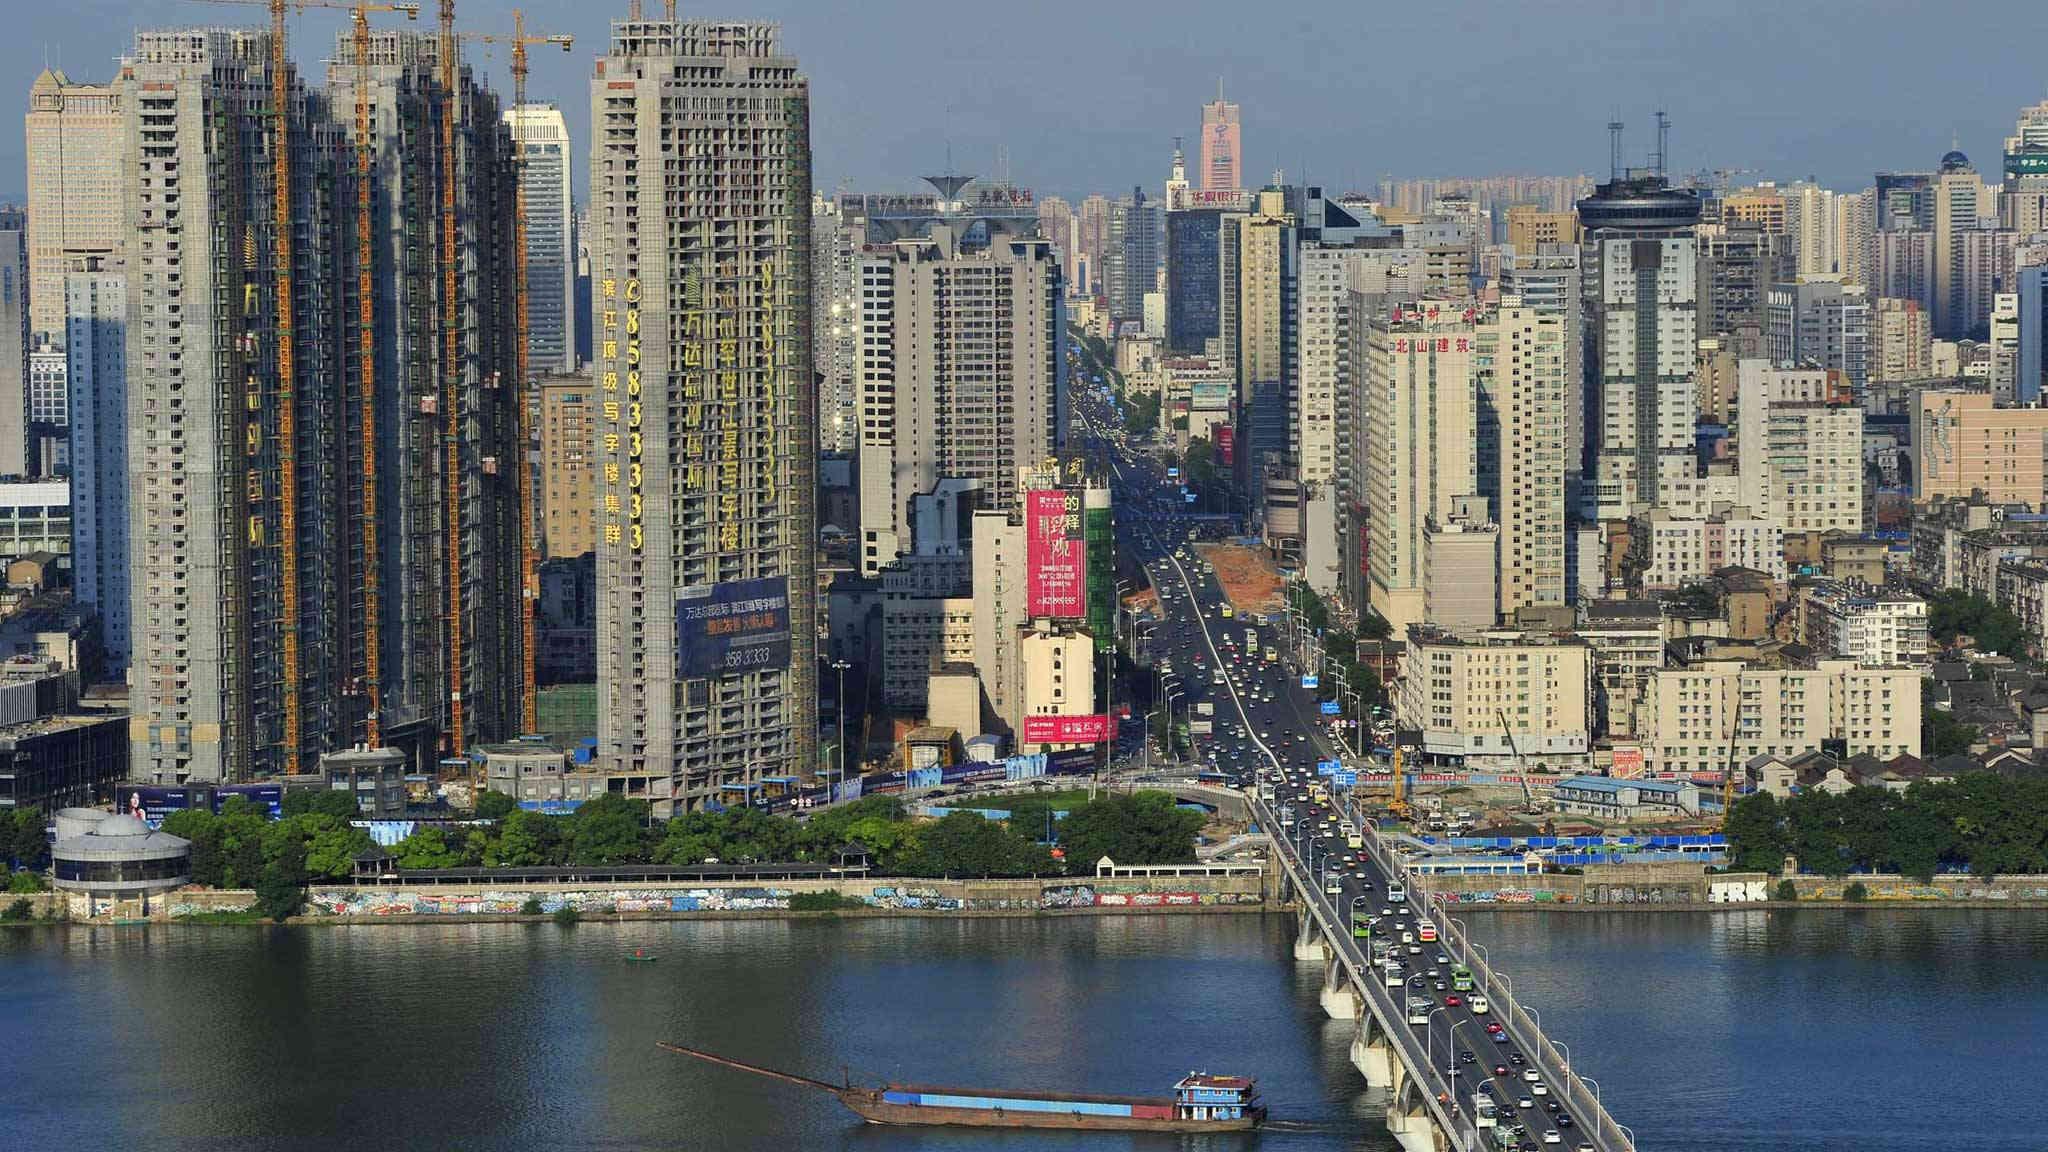 Tionghoa -Sejarah Singkat Kota Changsha Yang Perlu Kamu Ketahui - 1